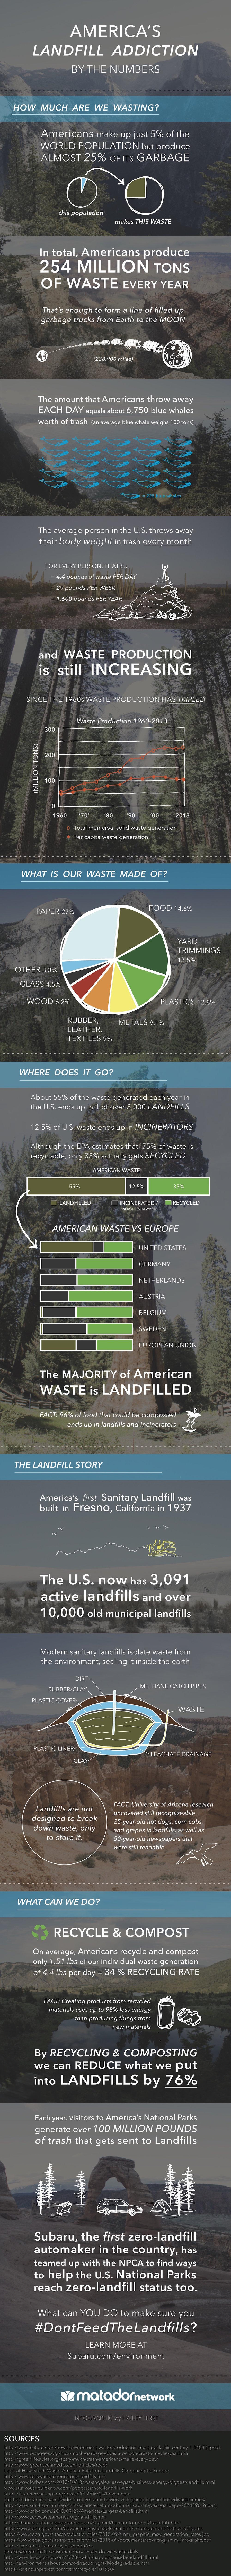 America's Landfill Addiction -   Matador Network & Subaru